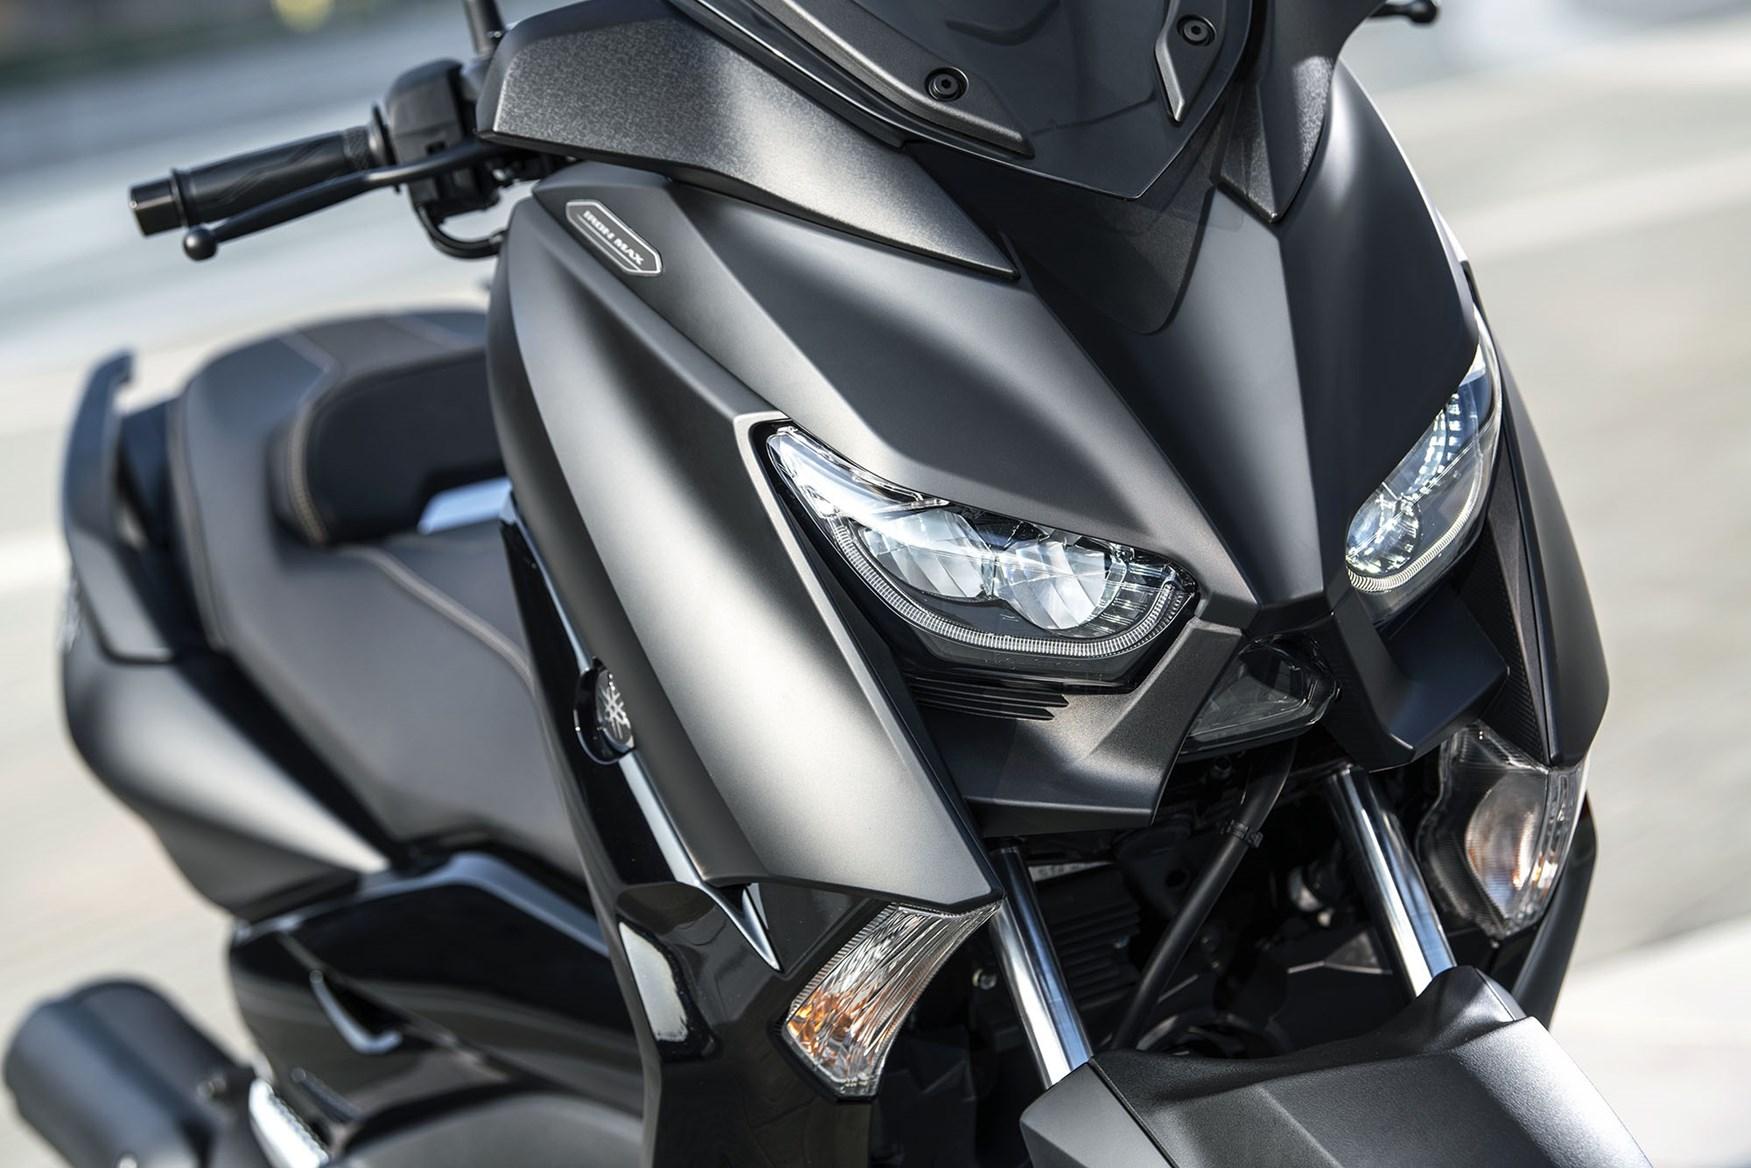 Yamaha release premium XMAX Iron Max scooter